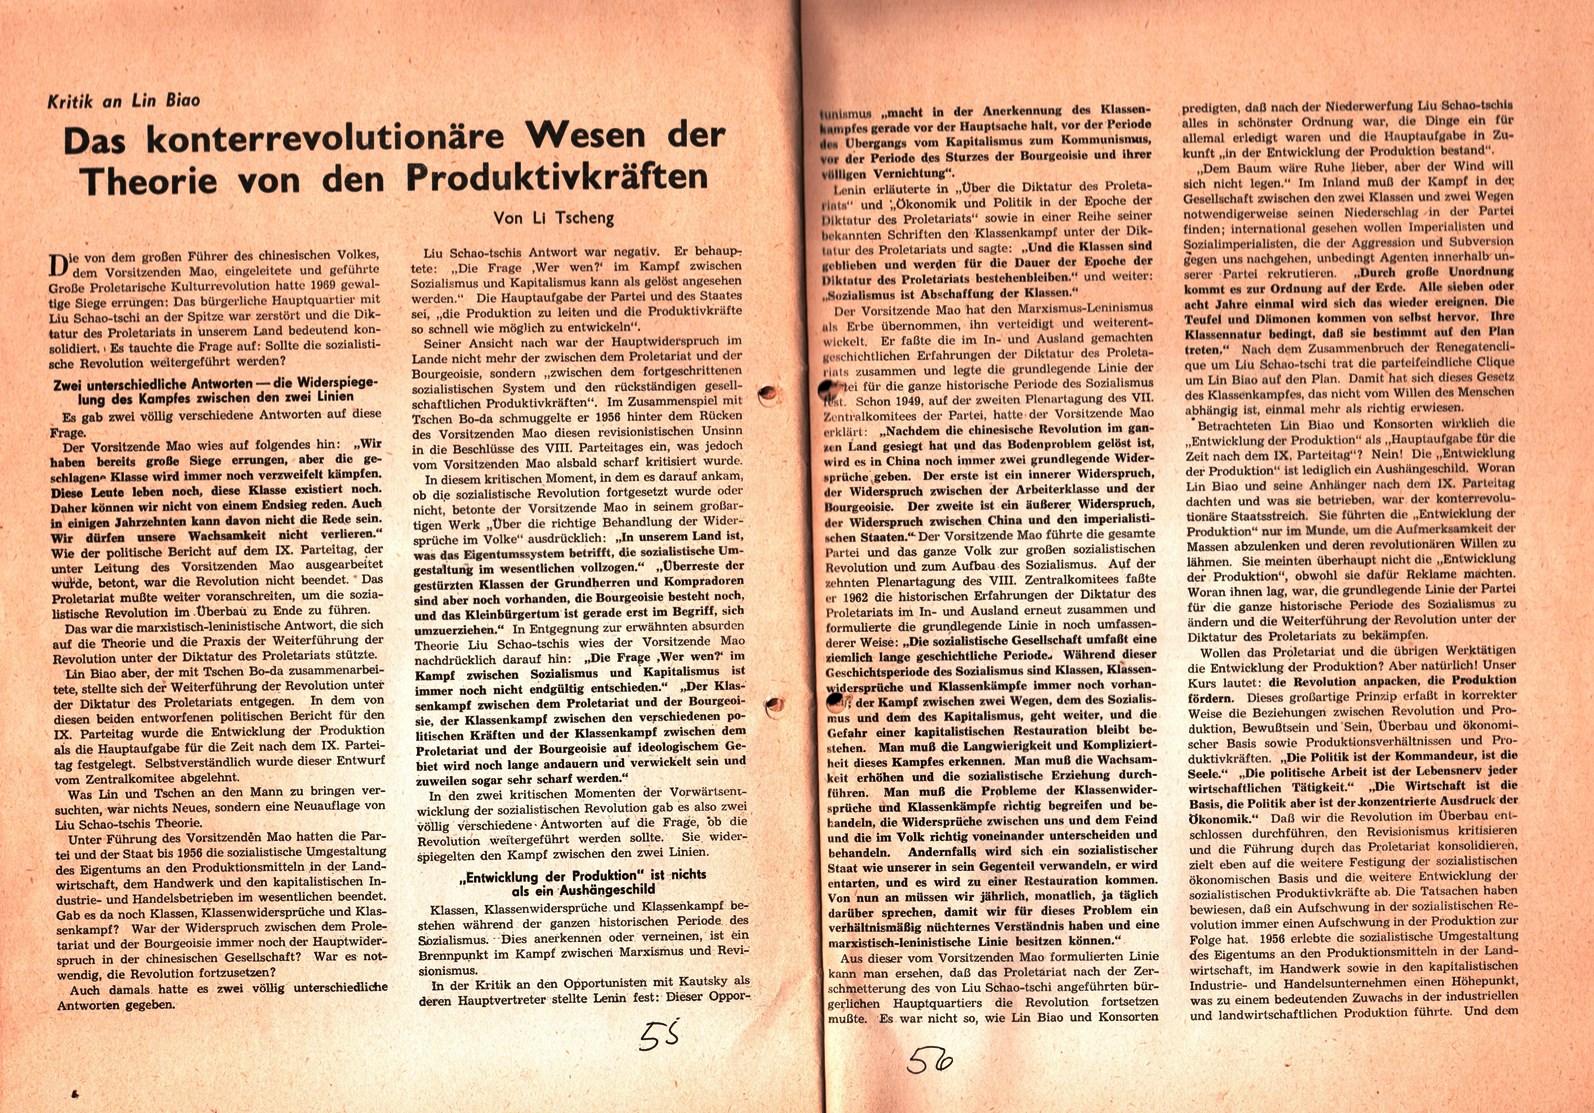 KSV_1974_Materialien_zur_Programmdiskussion_01_029